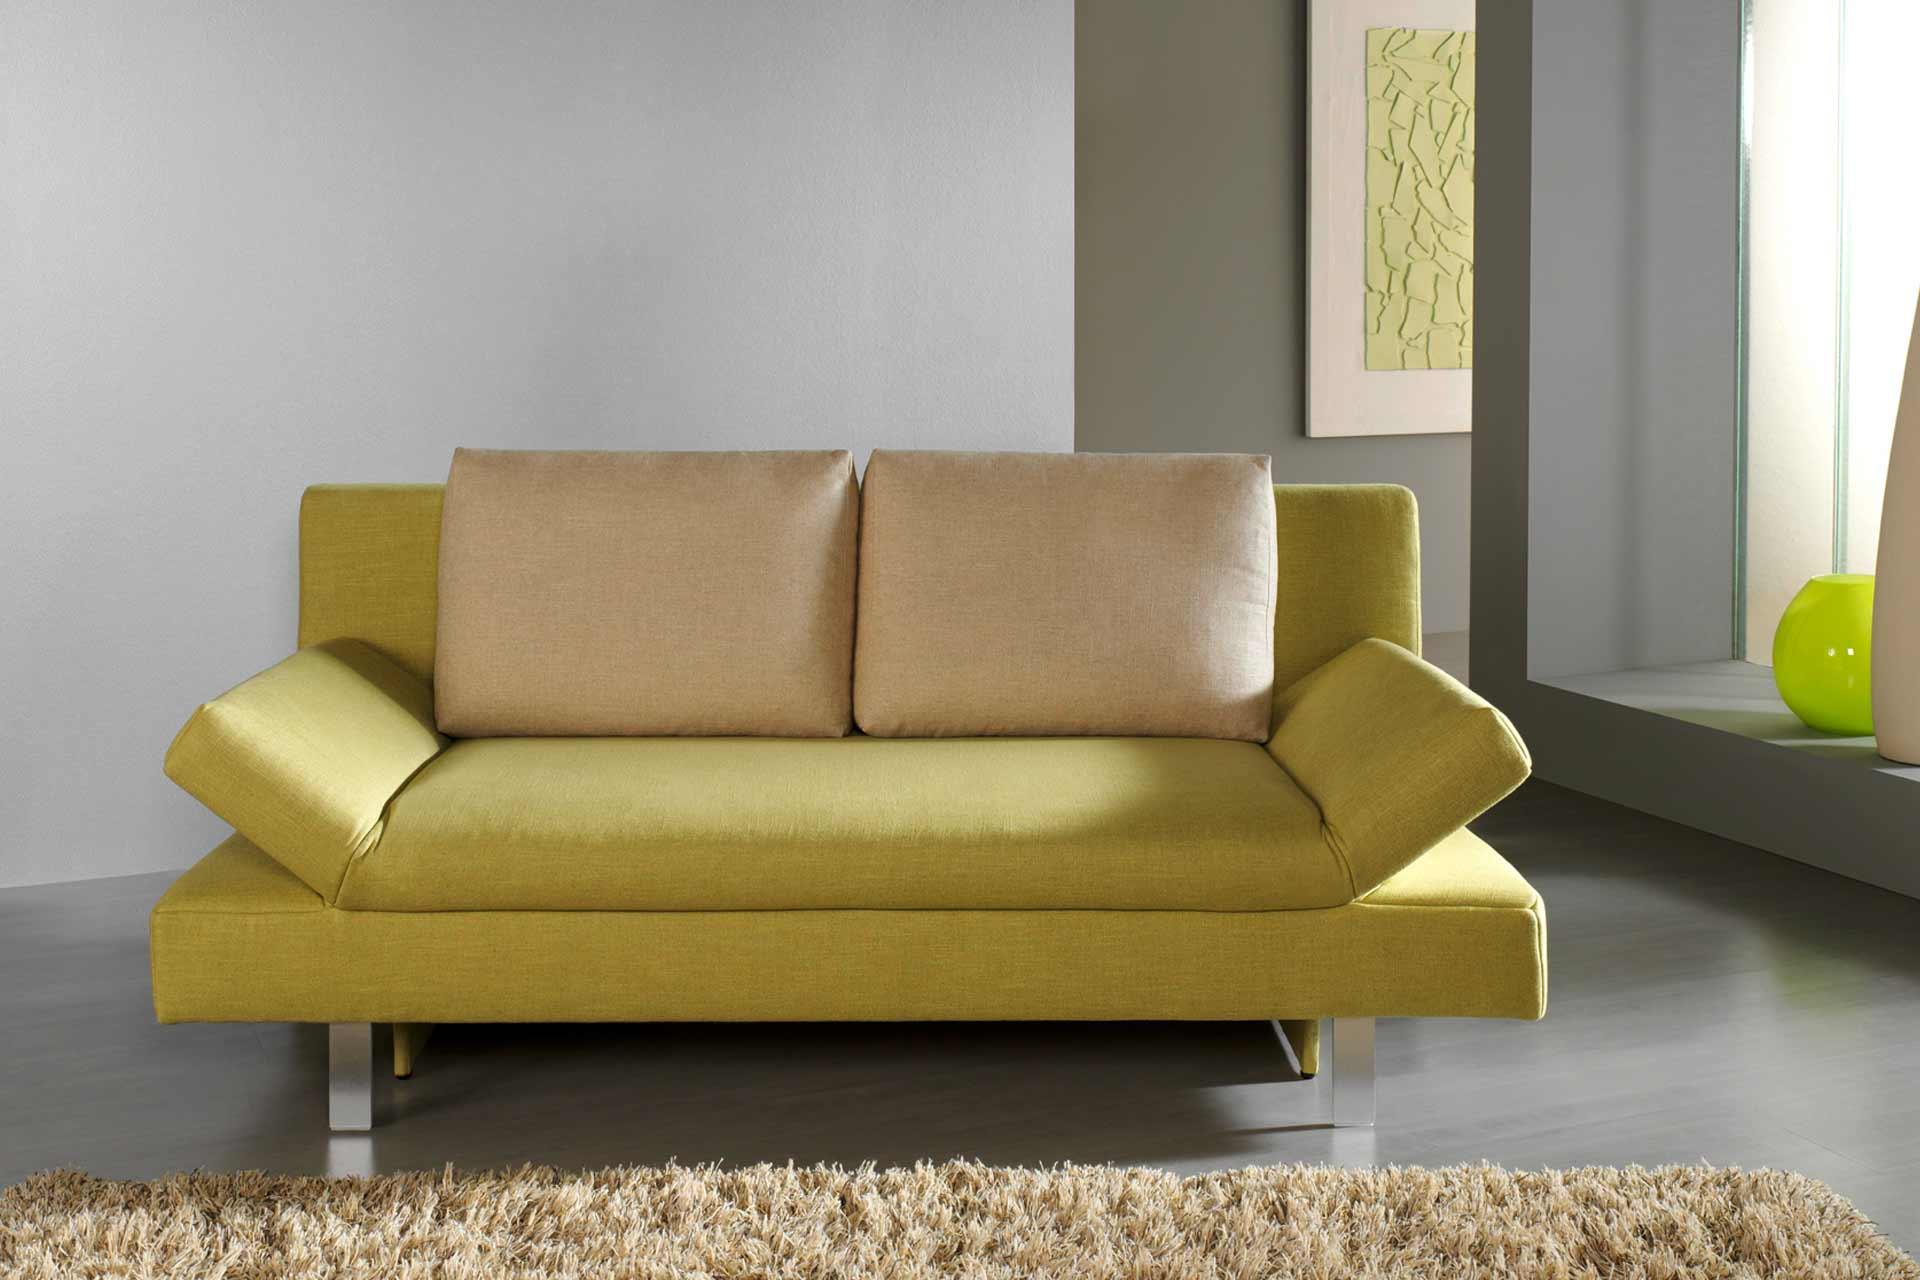 jesolo im stoff hot madison wohnopposition berlin. Black Bedroom Furniture Sets. Home Design Ideas